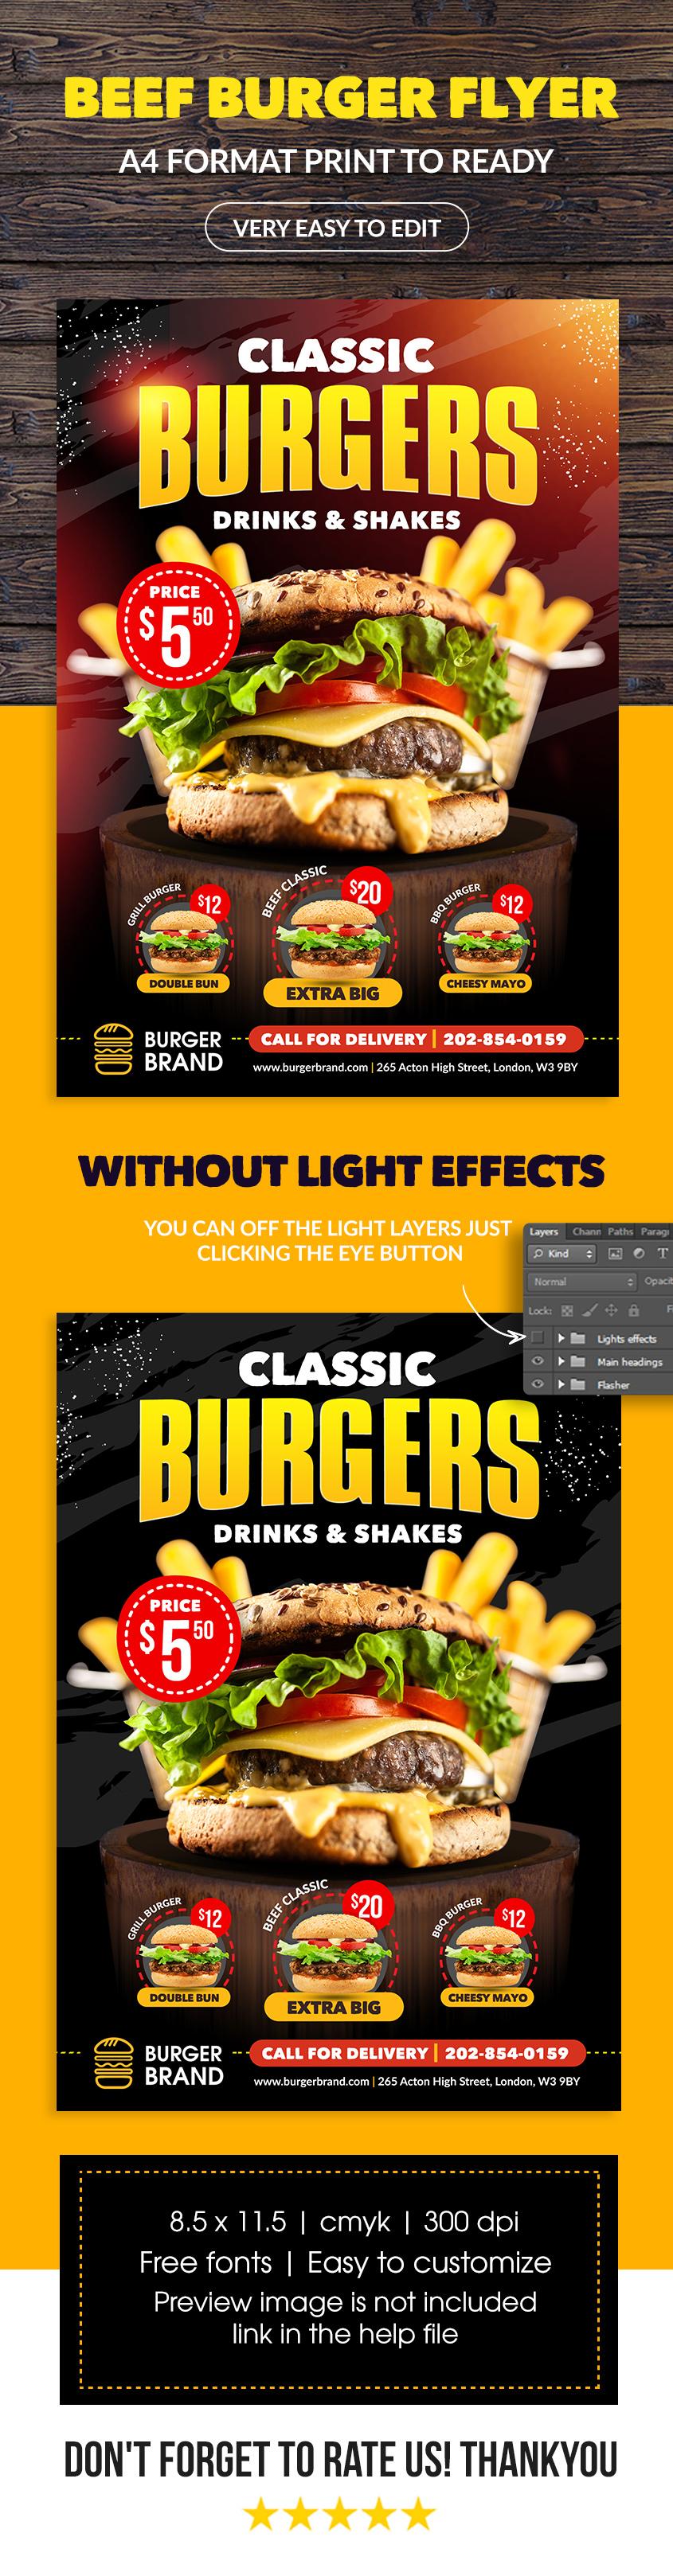 beef burger flyer template